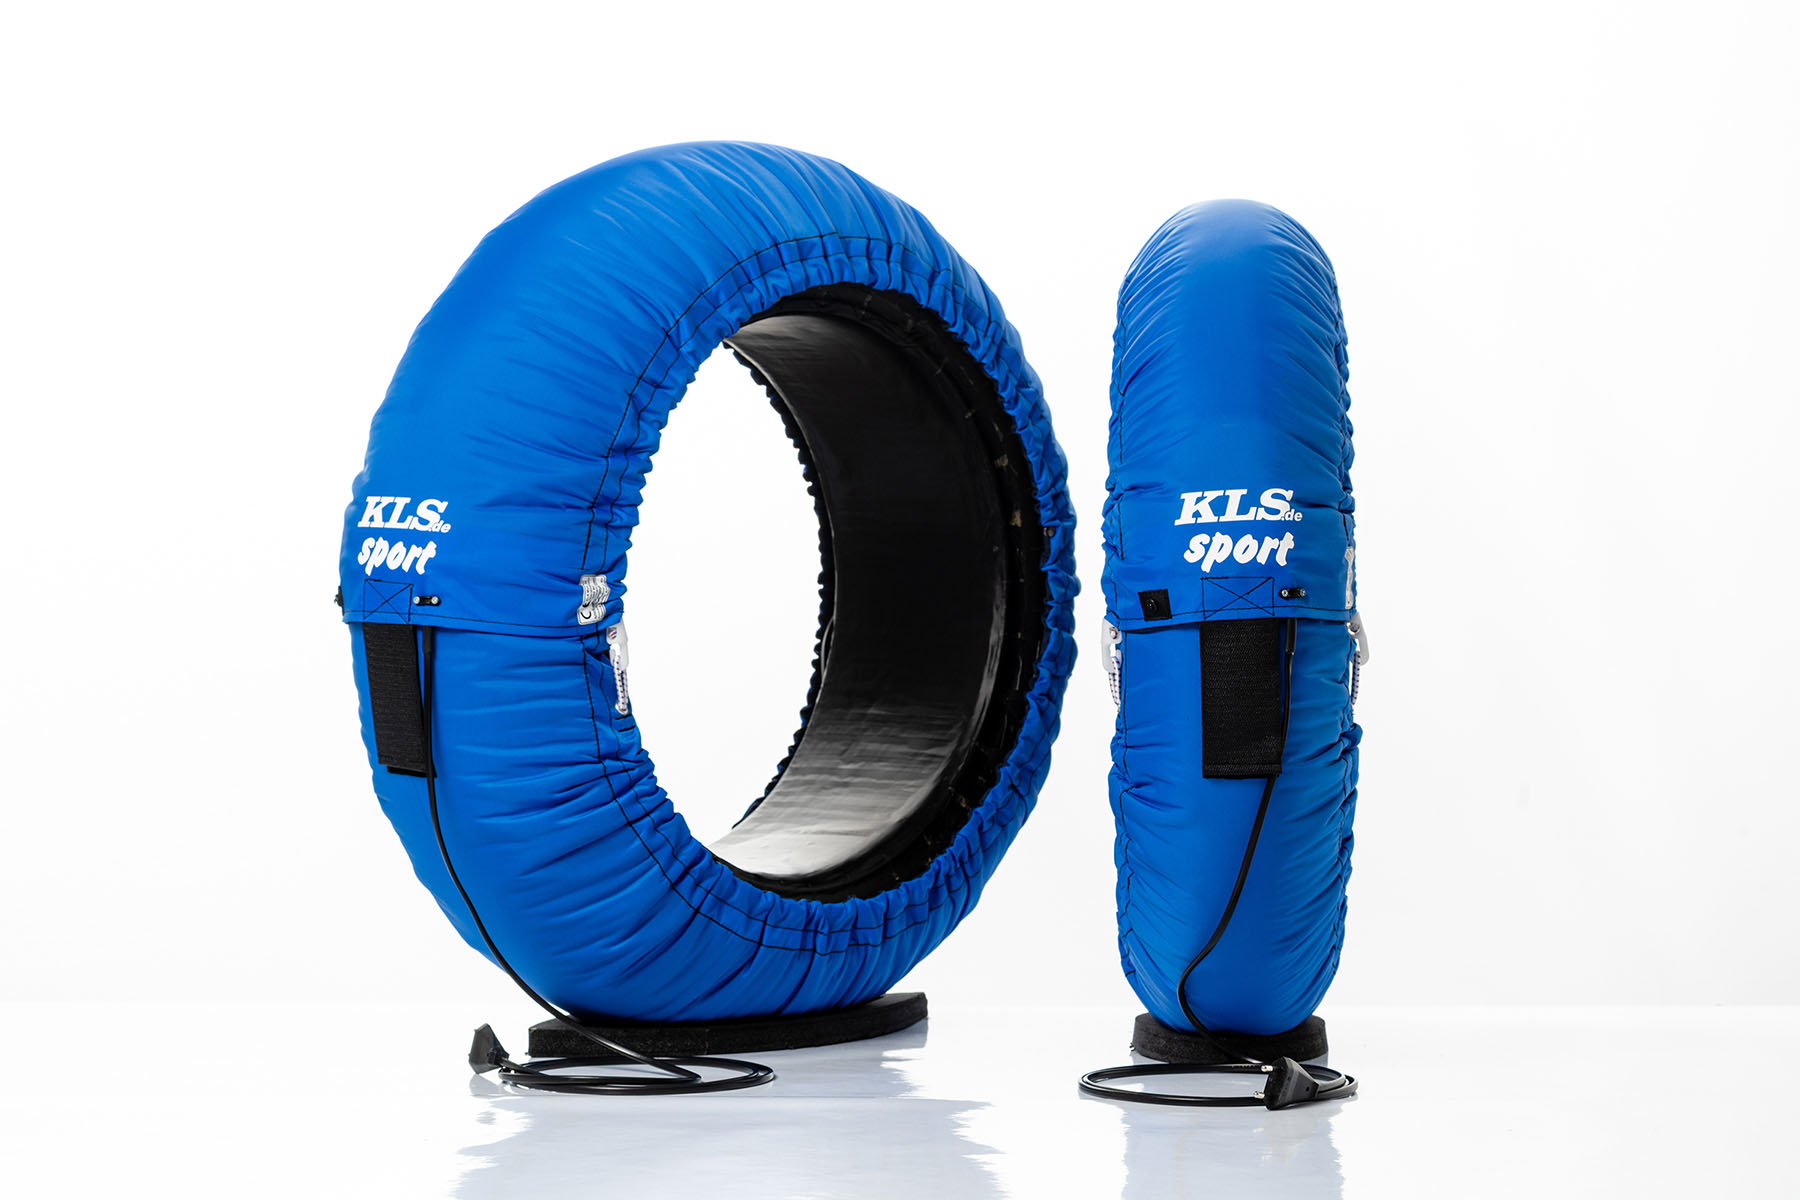 tyrewarmer--kls-sport-color-blue